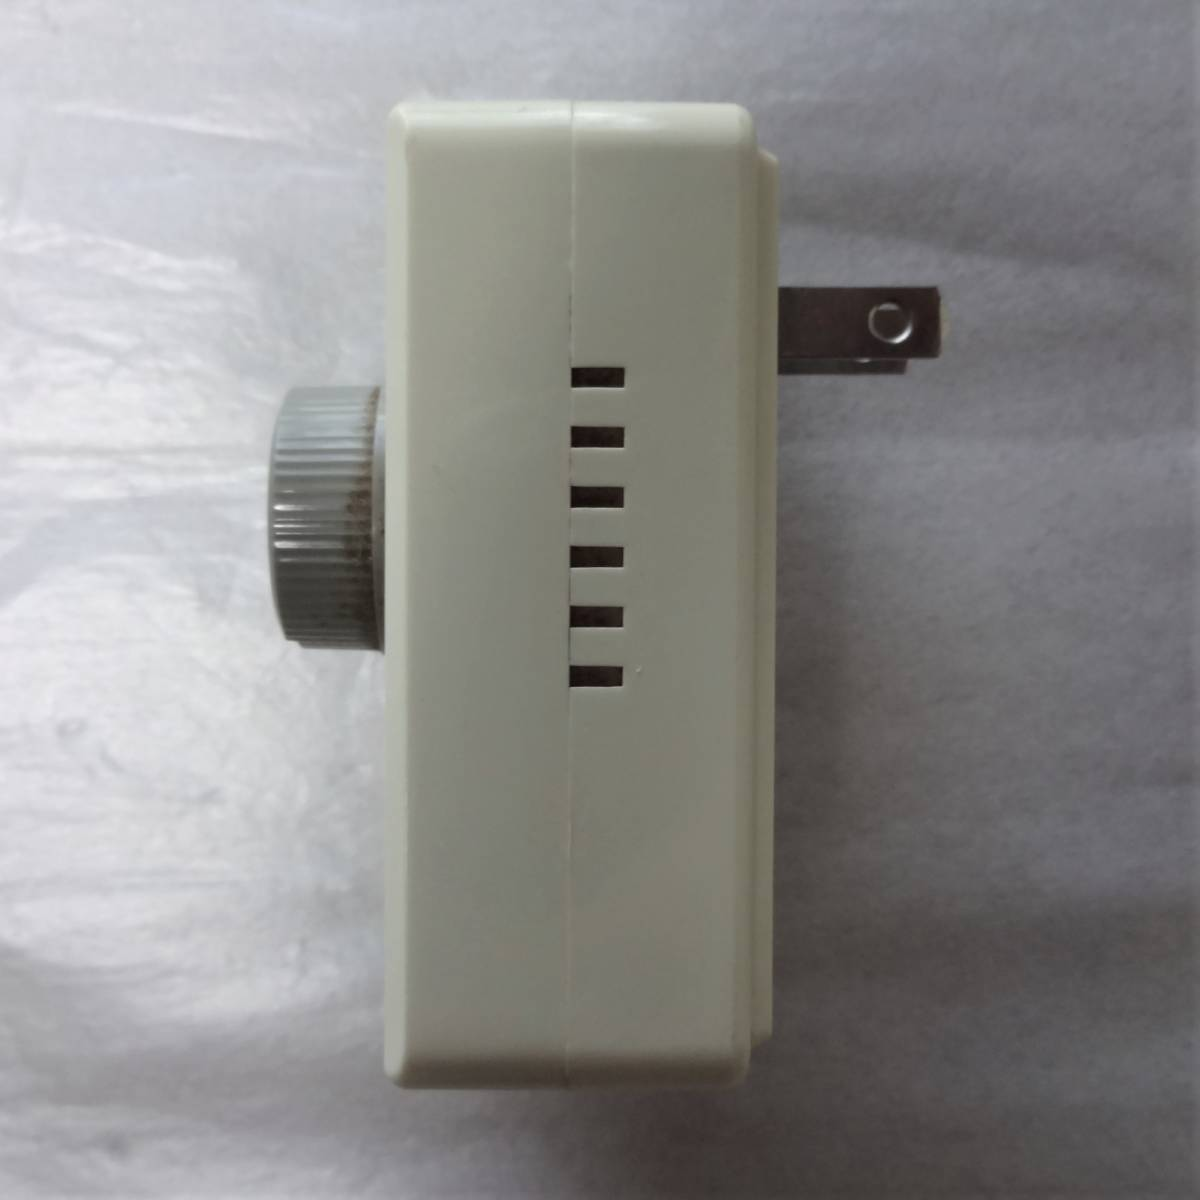 goot / 太洋電気産業 ライトコントローラー PC-30 廃番商品 半田ごてや白熱電球に対応_画像2